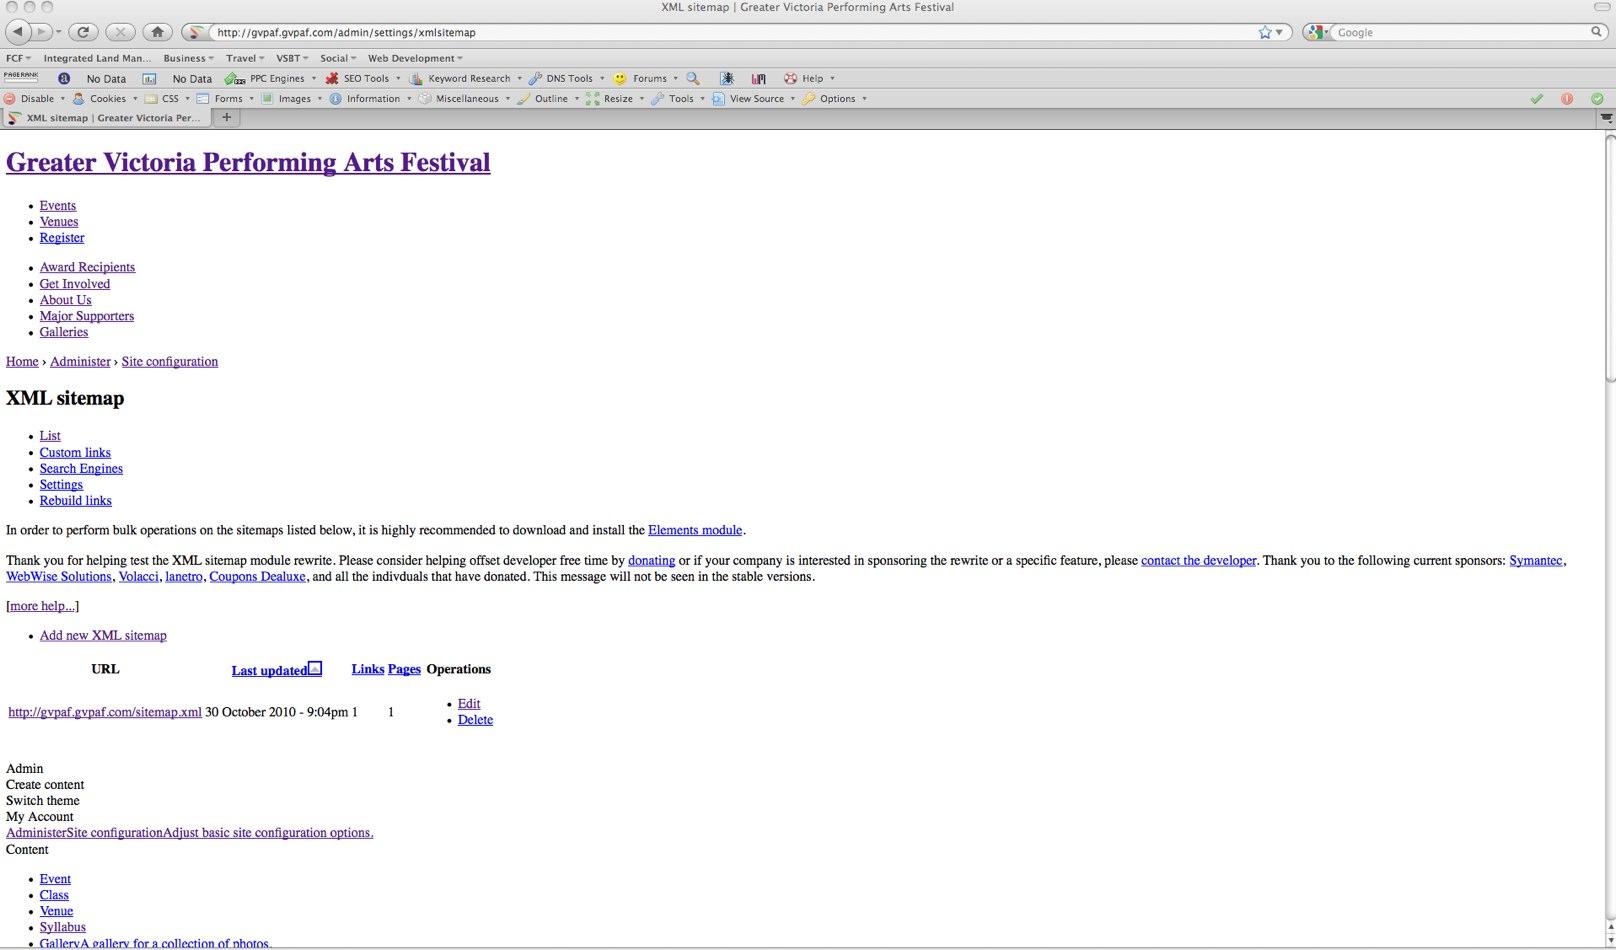 xml sitemap admin page breaks layout 954910 drupal org